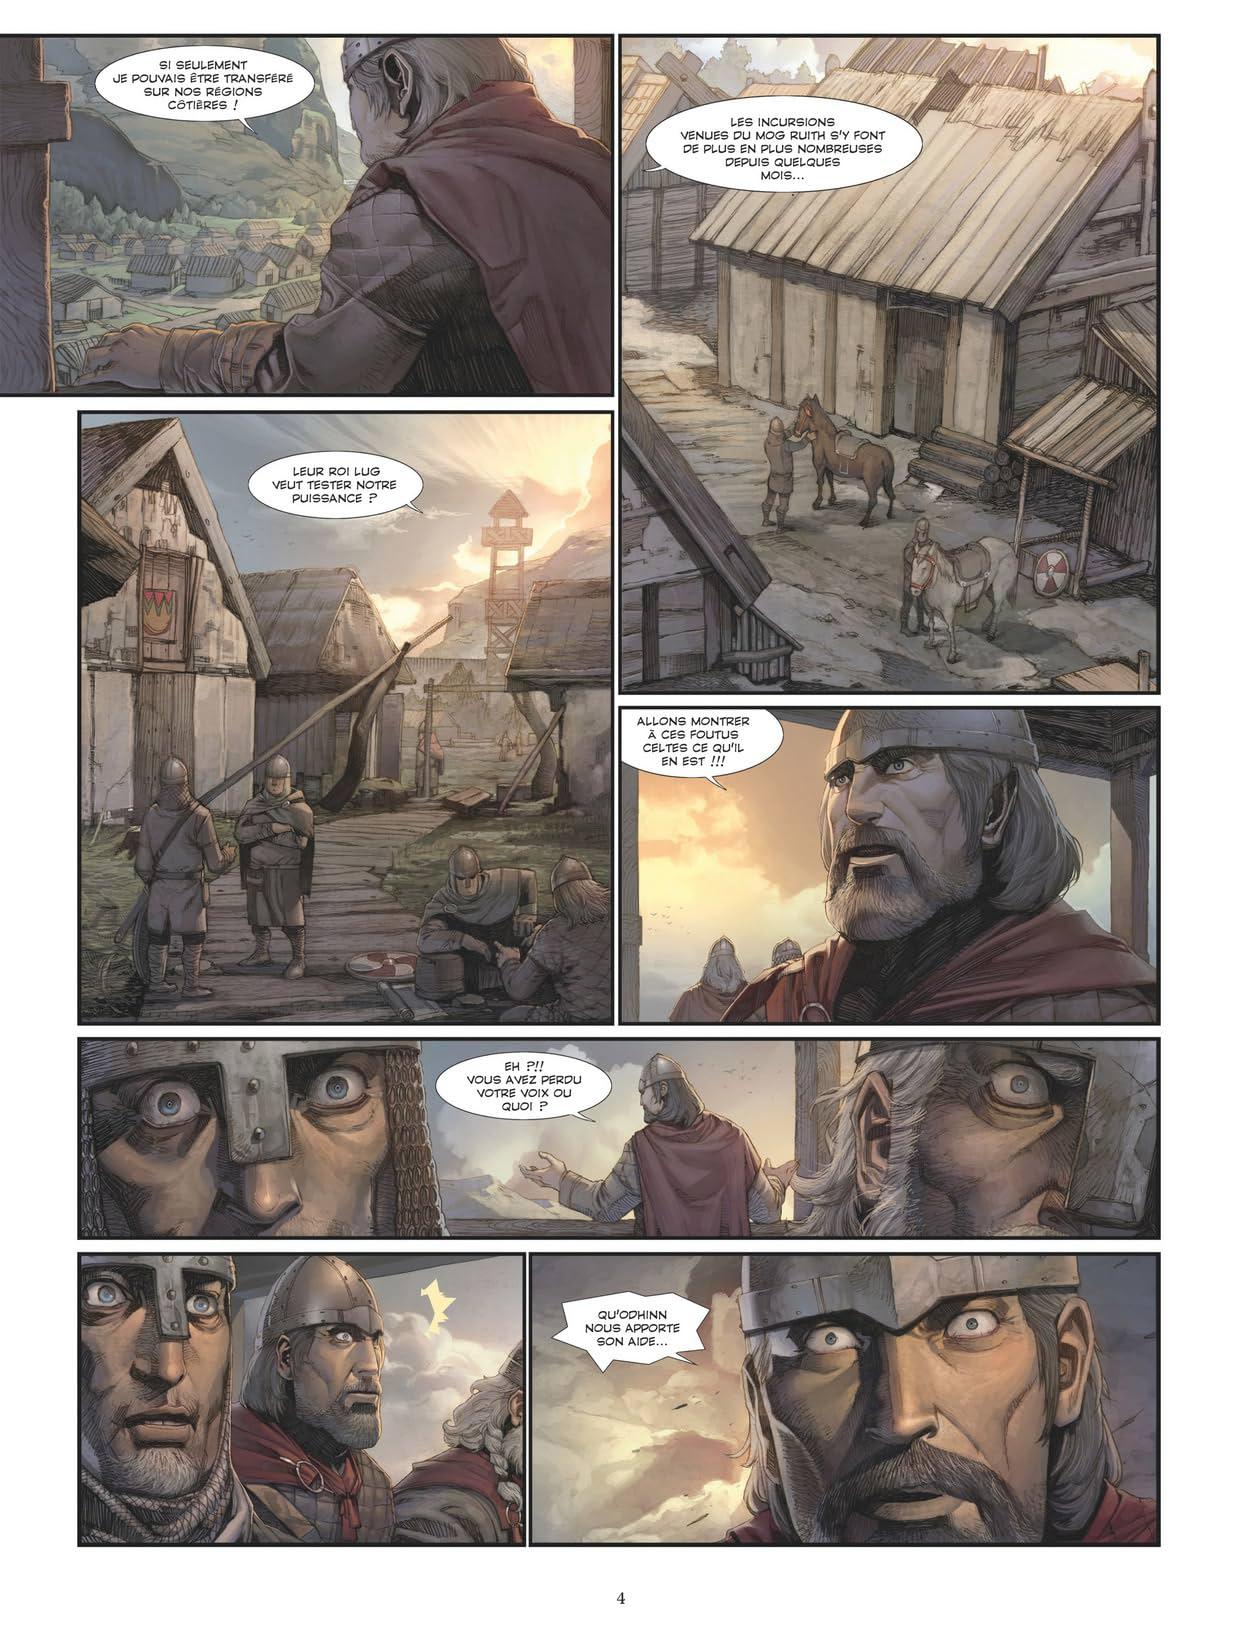 Konungar Vol. 1: Invasions